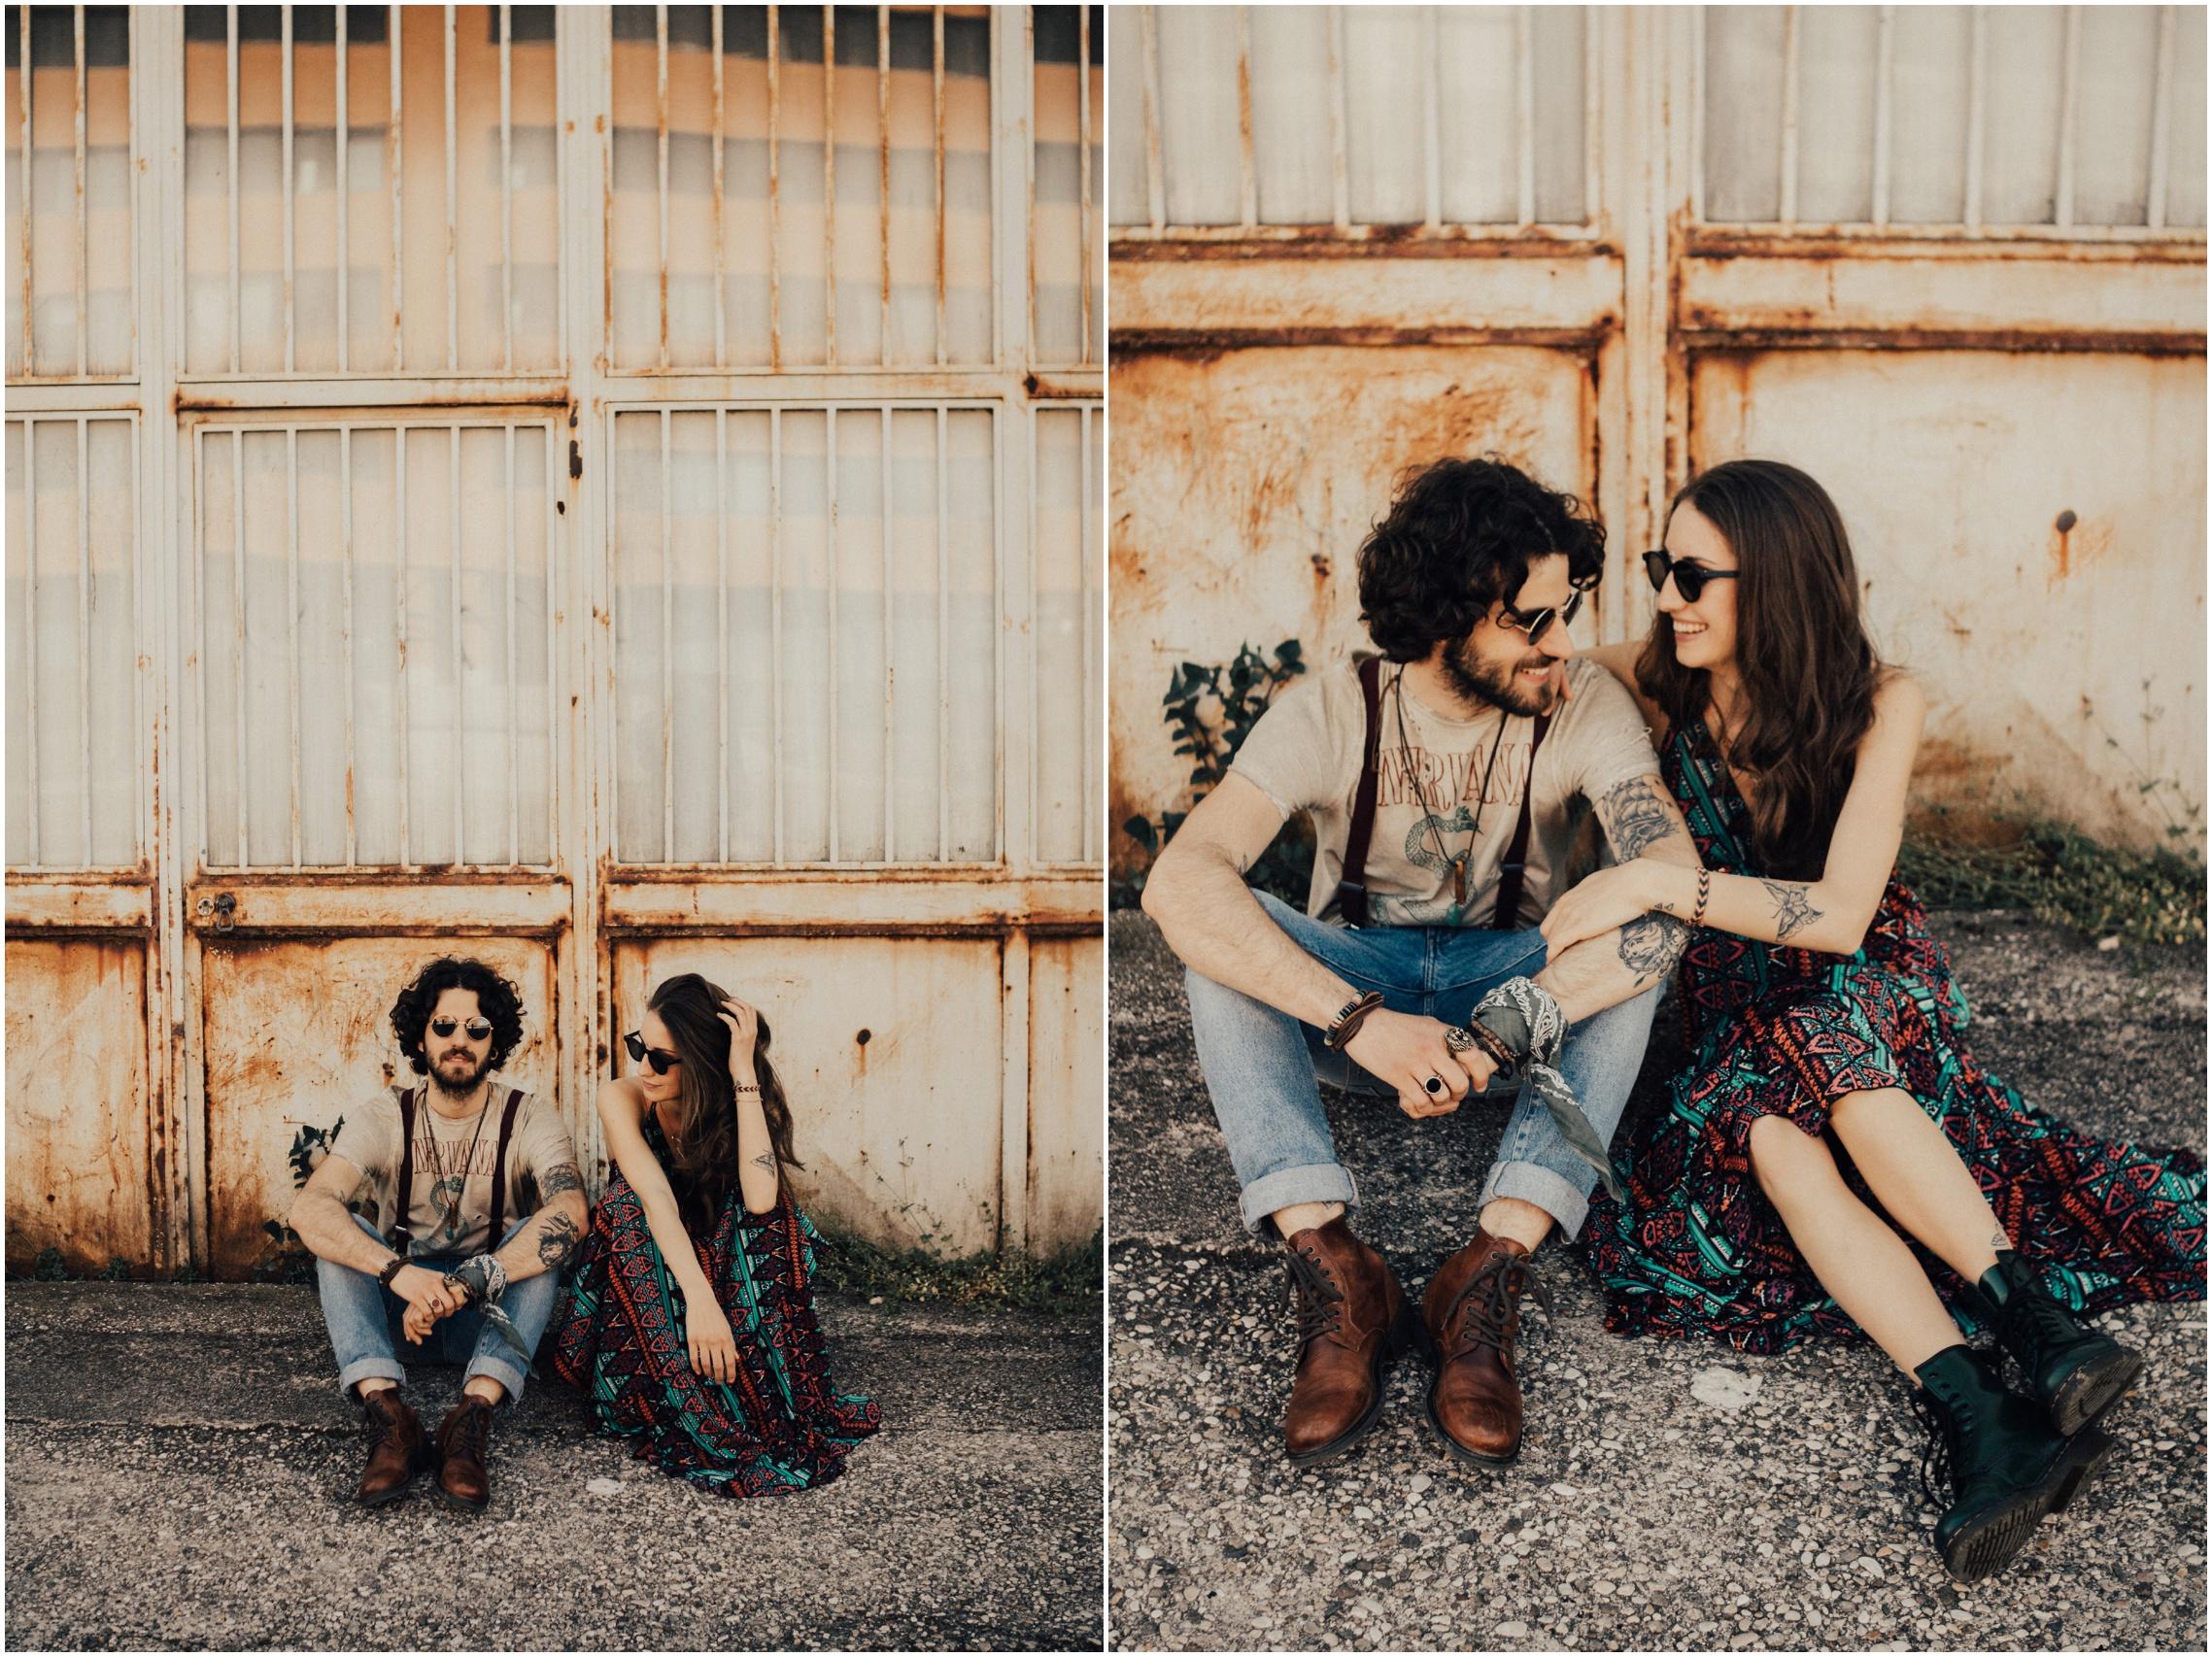 fotografo-matrimonio-engagement-vicenza-padova-stefano-degirmenci